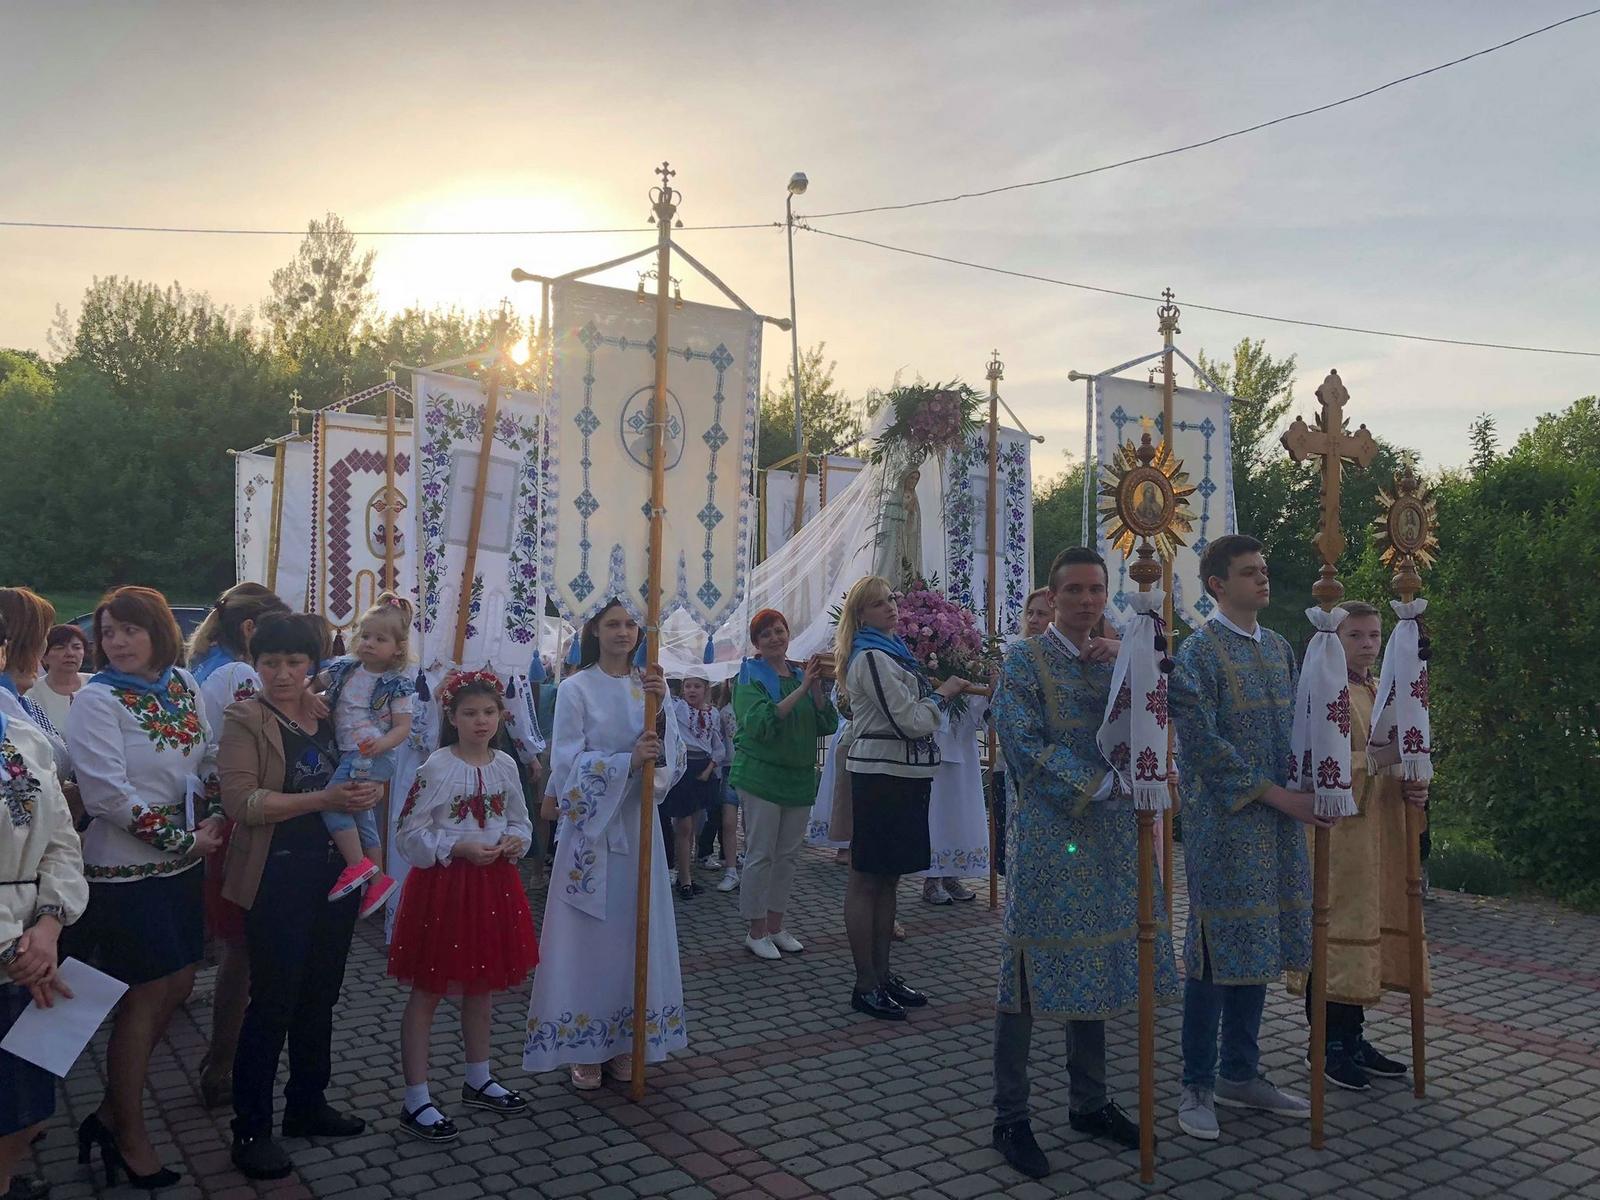 ditu_neporochnoi_2018-16.jpg